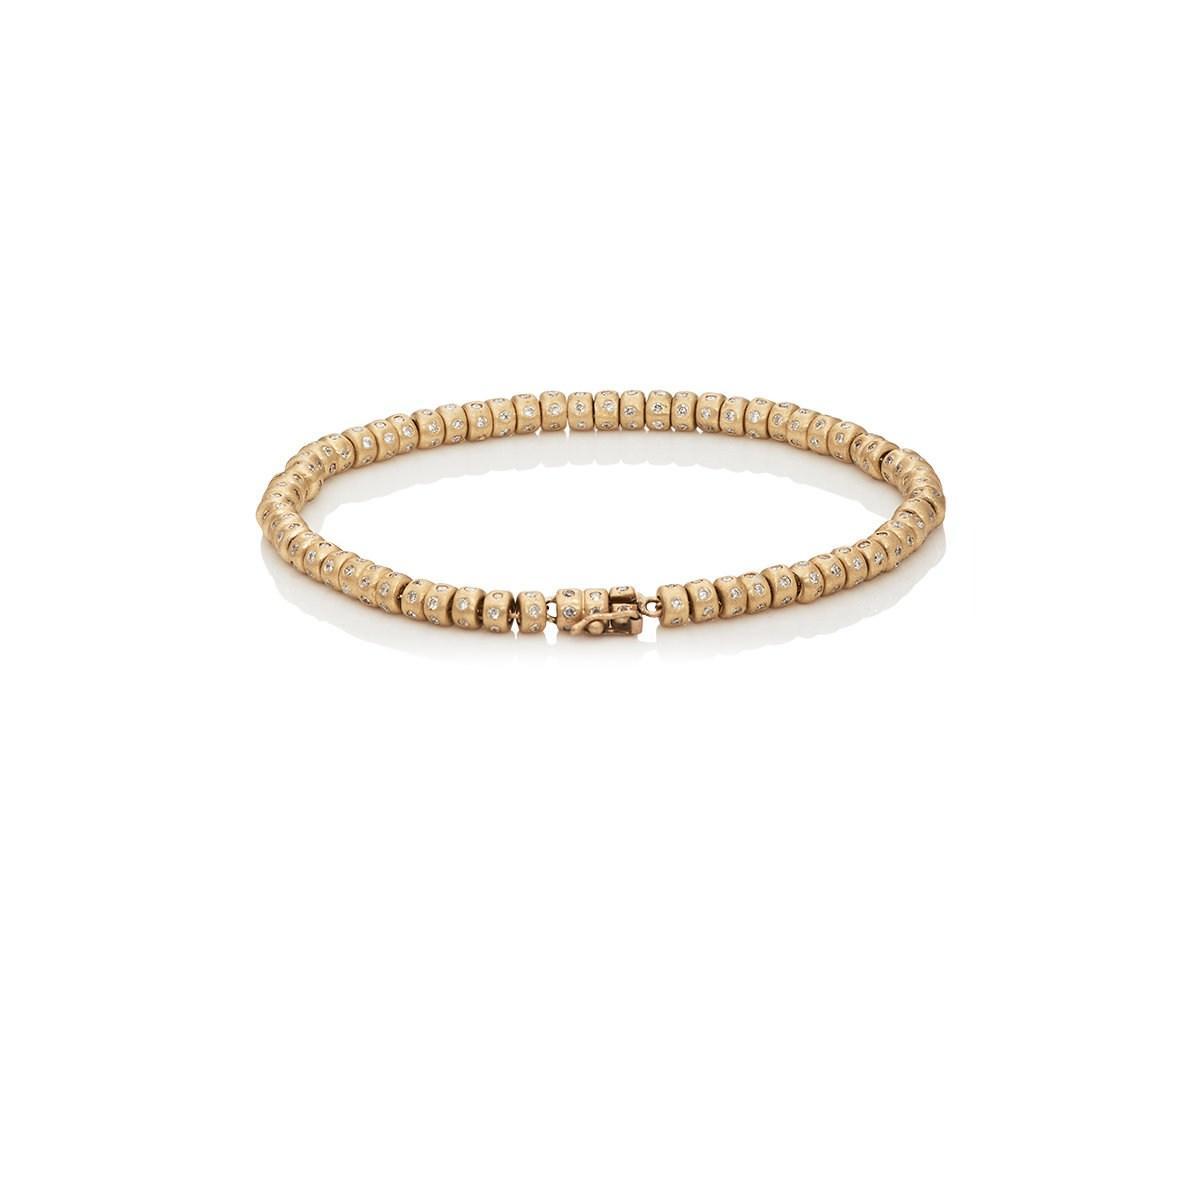 fa0c37379 Luis Morais White-diamond-embellished Beaded Bracelet in Metallic ...